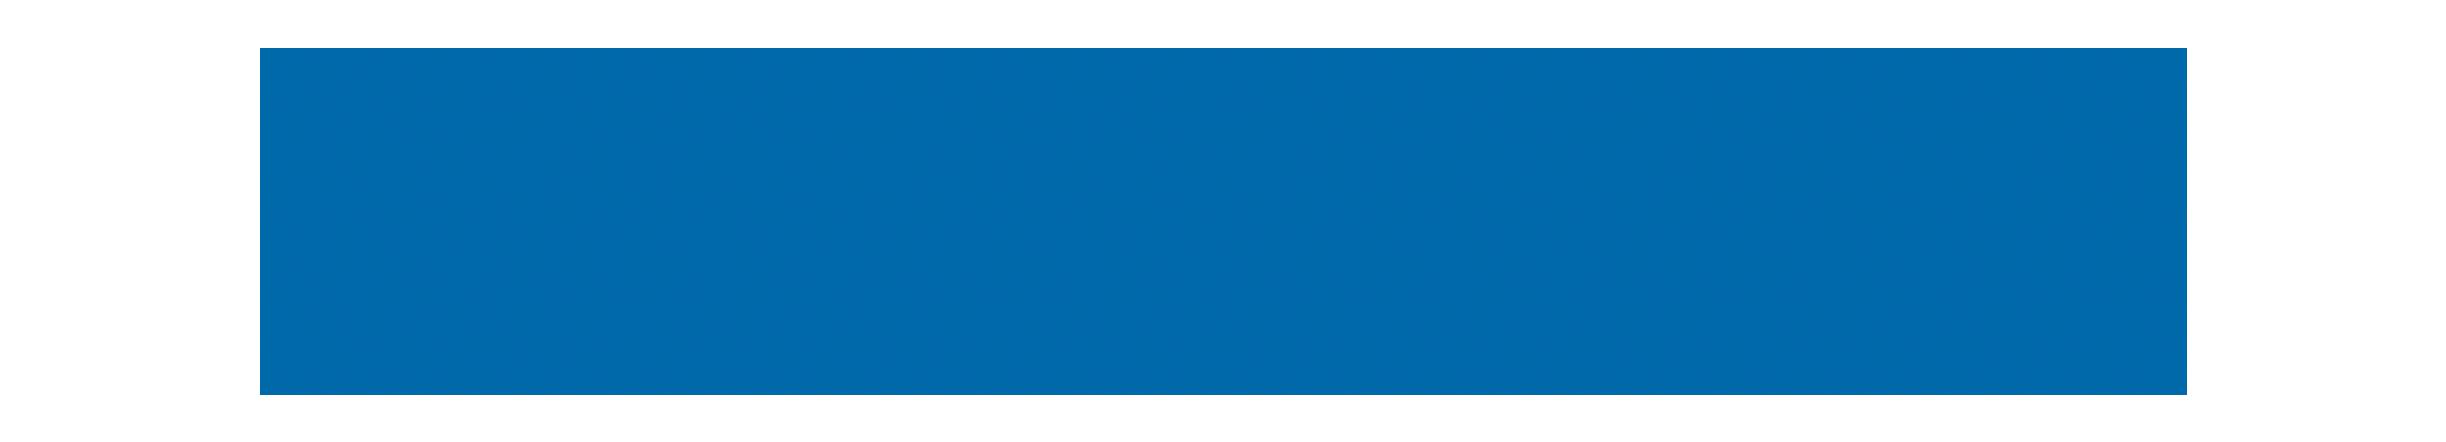 CASIO Logo.png